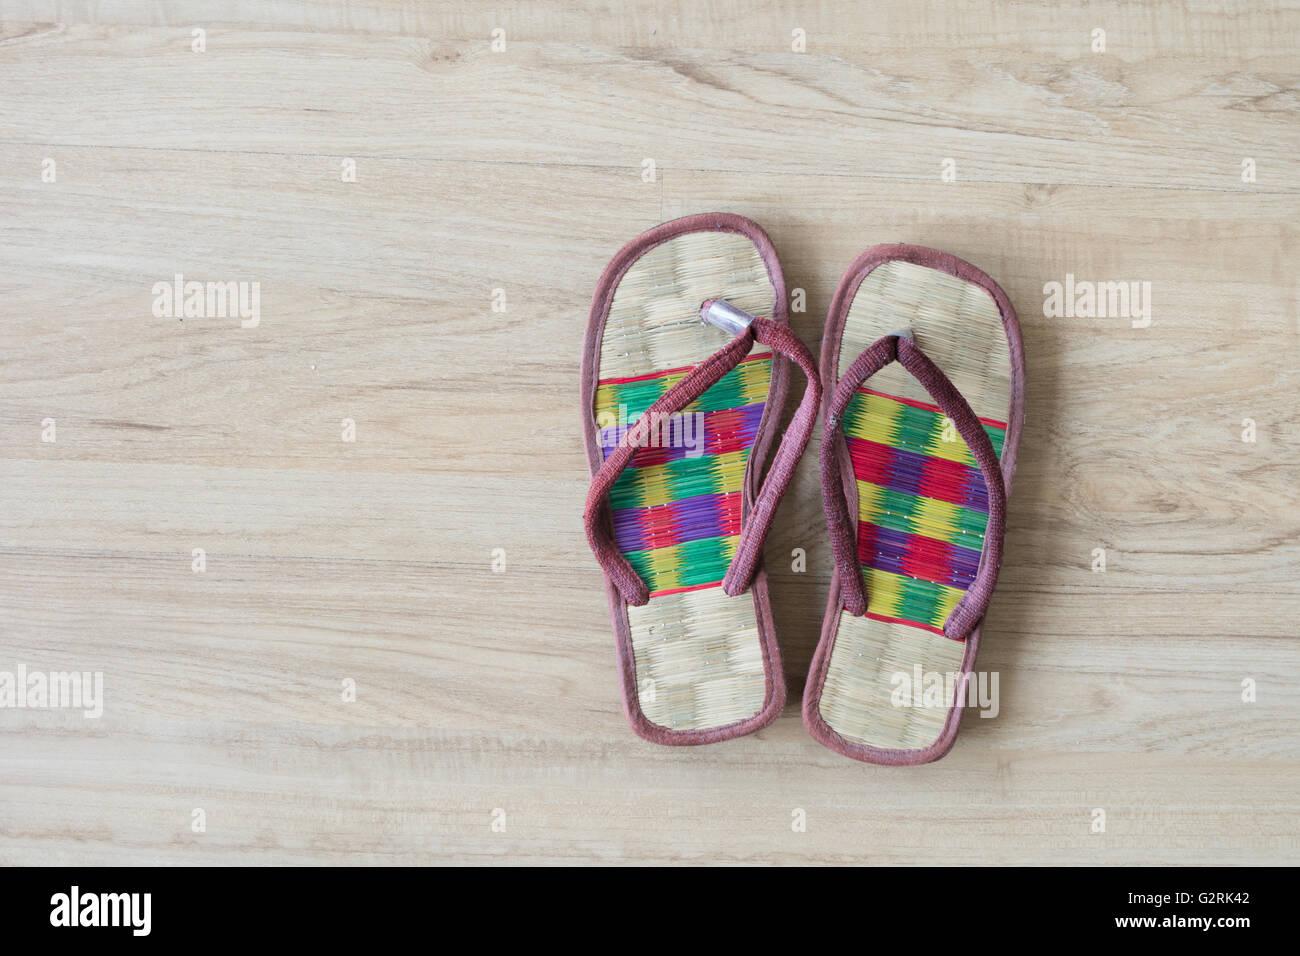 spa cozy weave sandal on wooden floor. - Stock Image